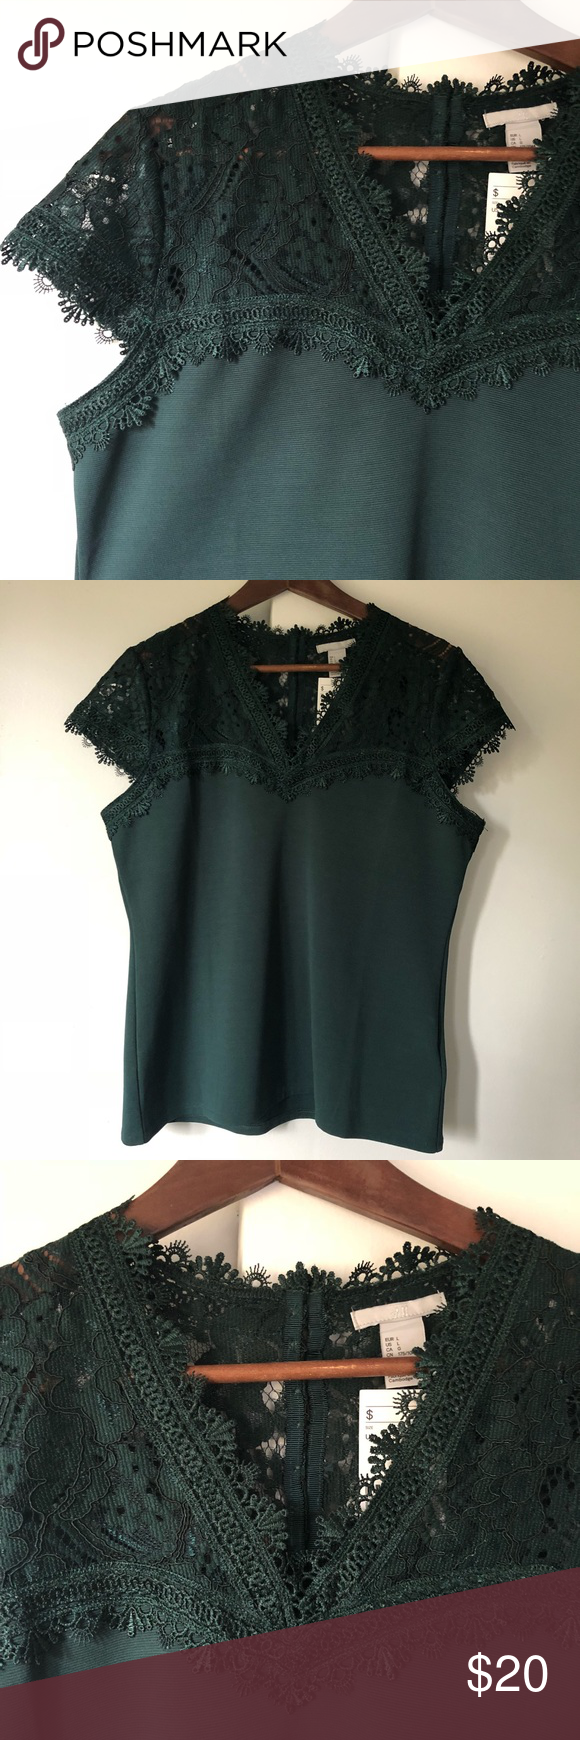 H&m green lace dress  HuM dark green Lacey top sz L NWT Gorgeous NWT  Pinterest